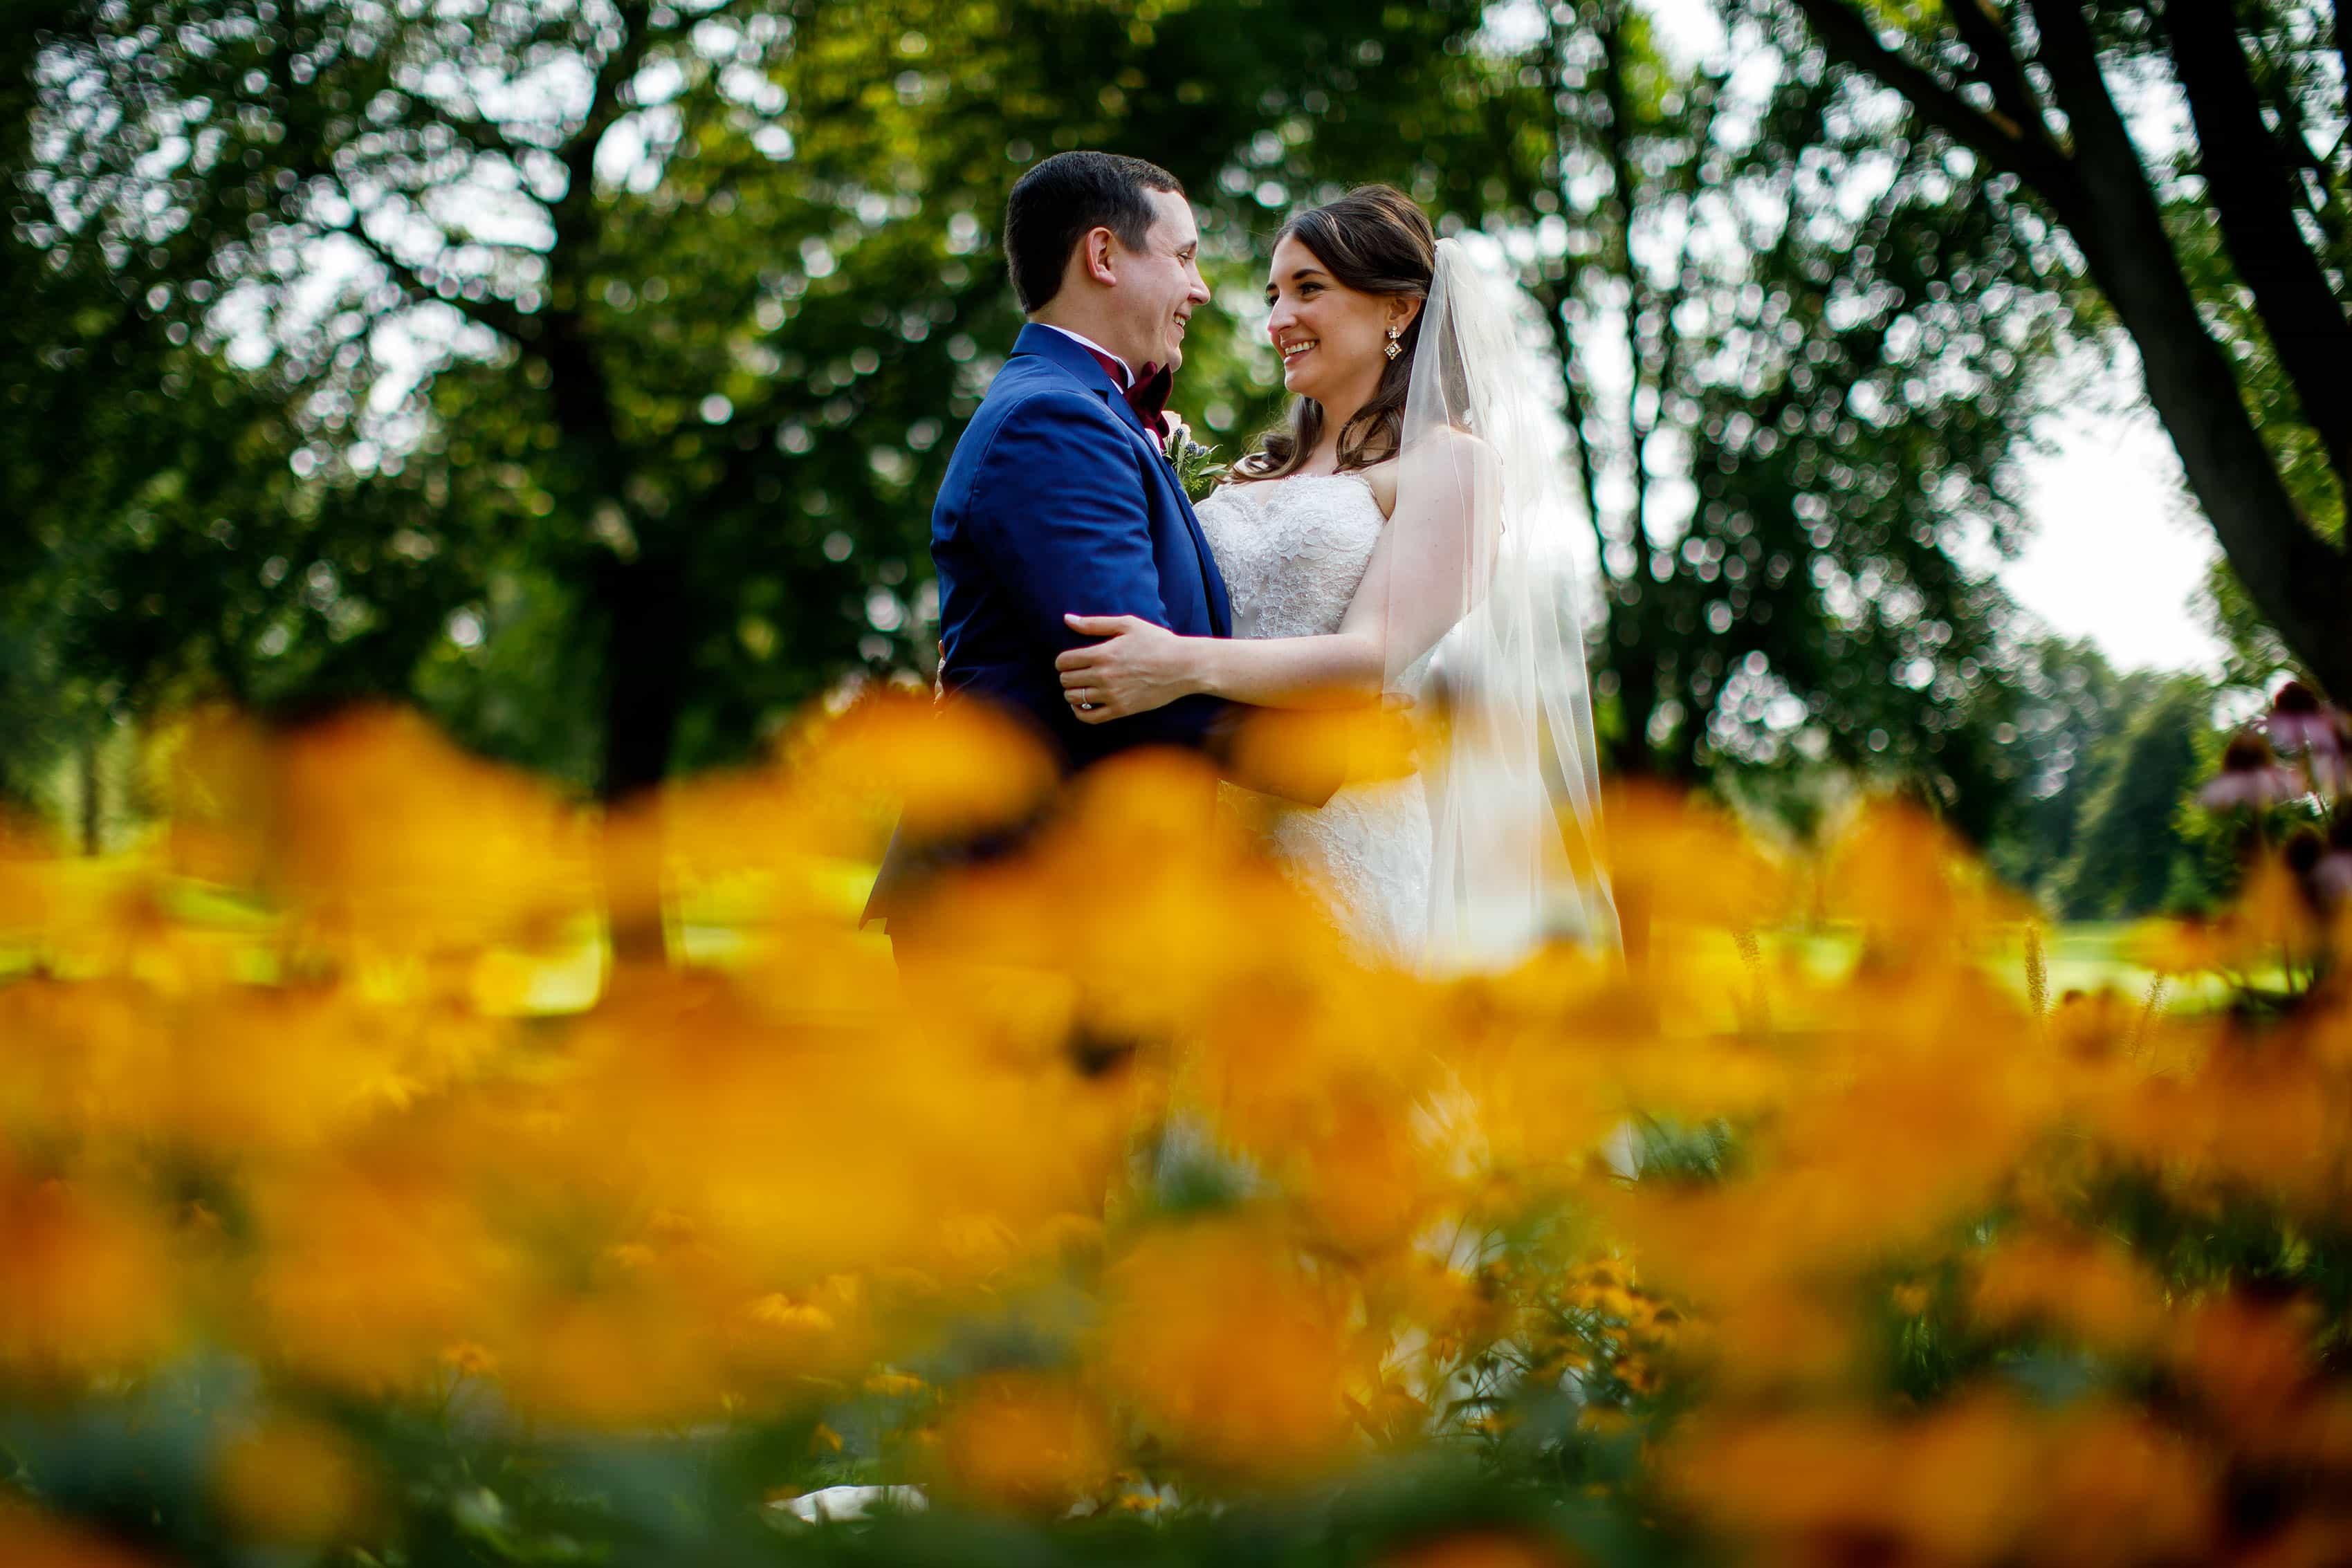 Katie and Joel embrace near the flower garden